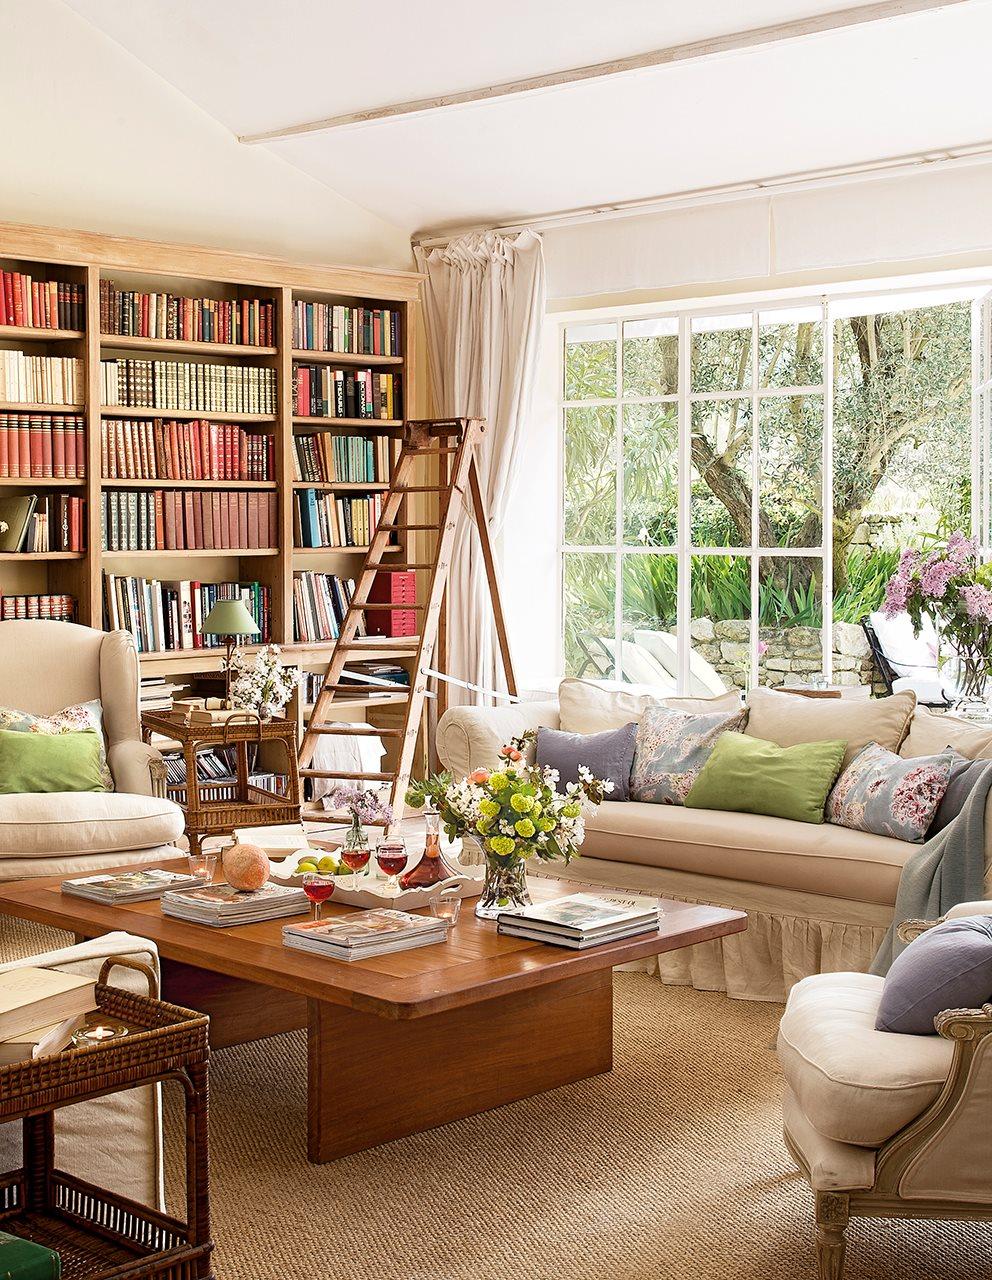 salon biblioteca con libreria a medida y escalera 992x1280 - La Ferme du Bon Dieu: A farm converted into a house which holds a love story